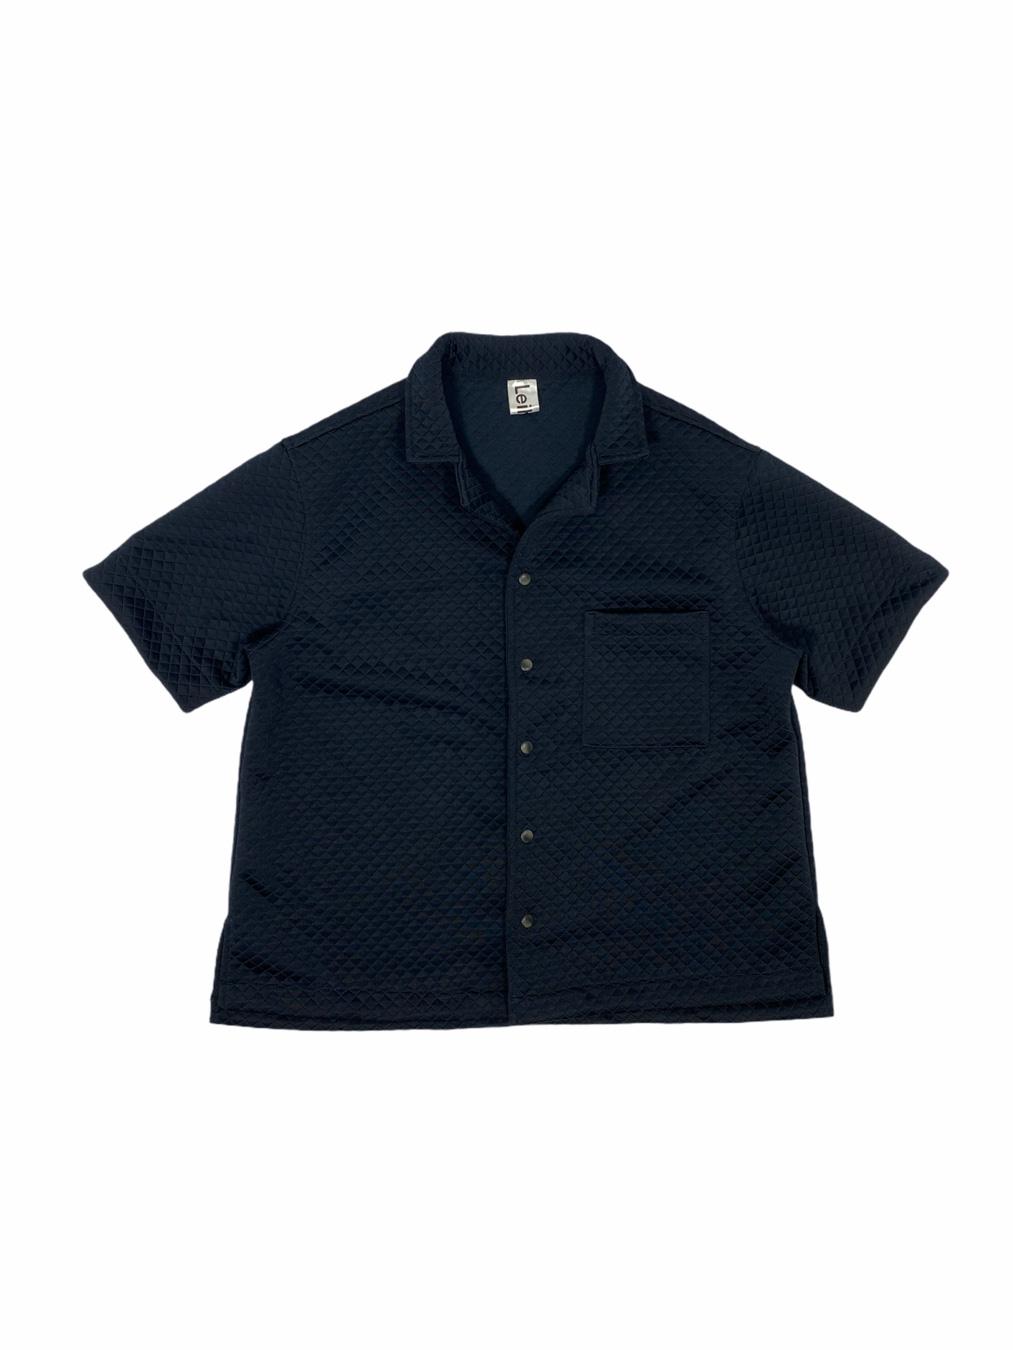 Bubble Shirt